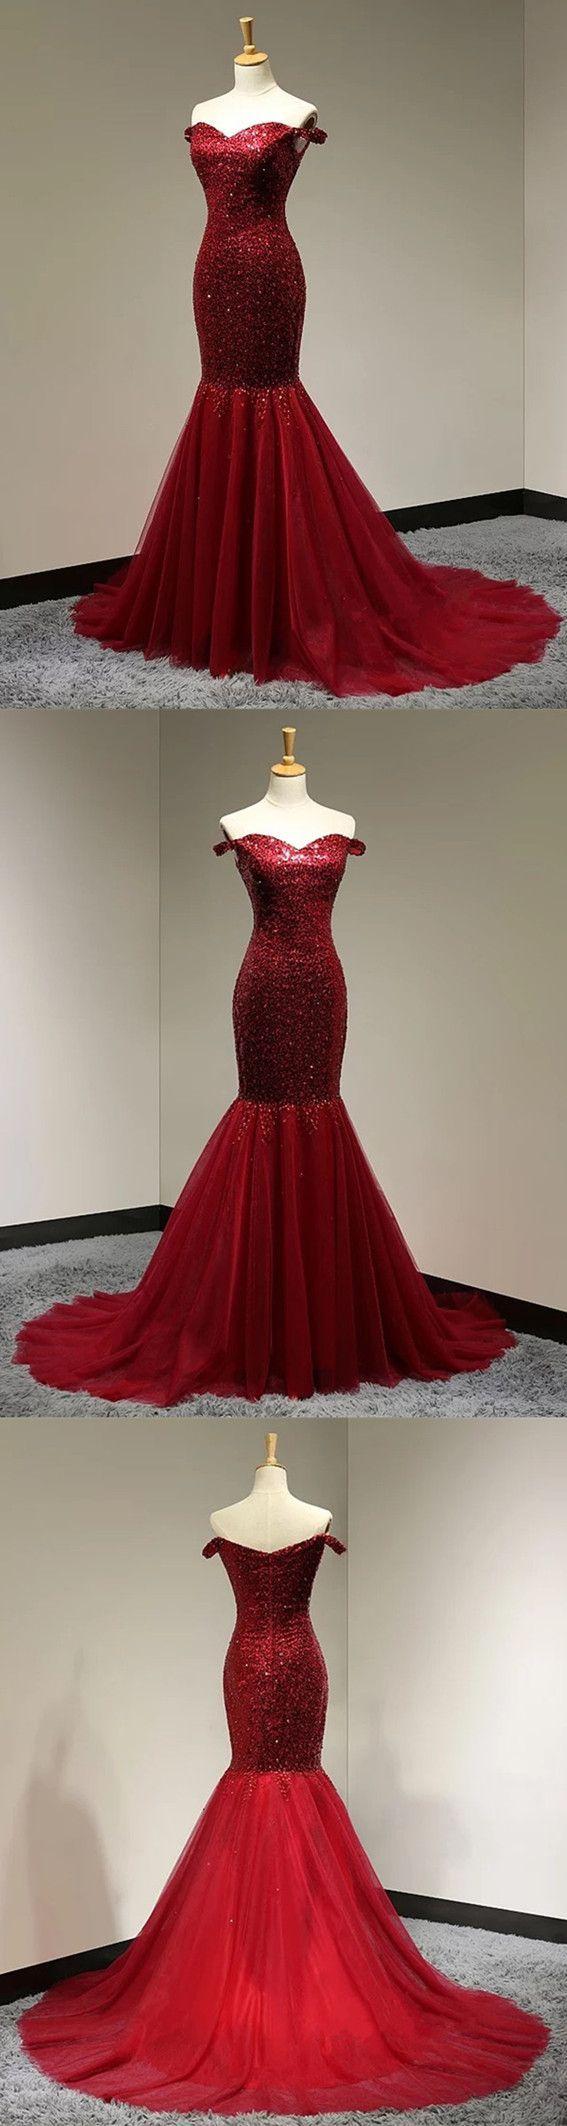 Burgundy sequins sweetheart mermaid evening dress off shoulder prom